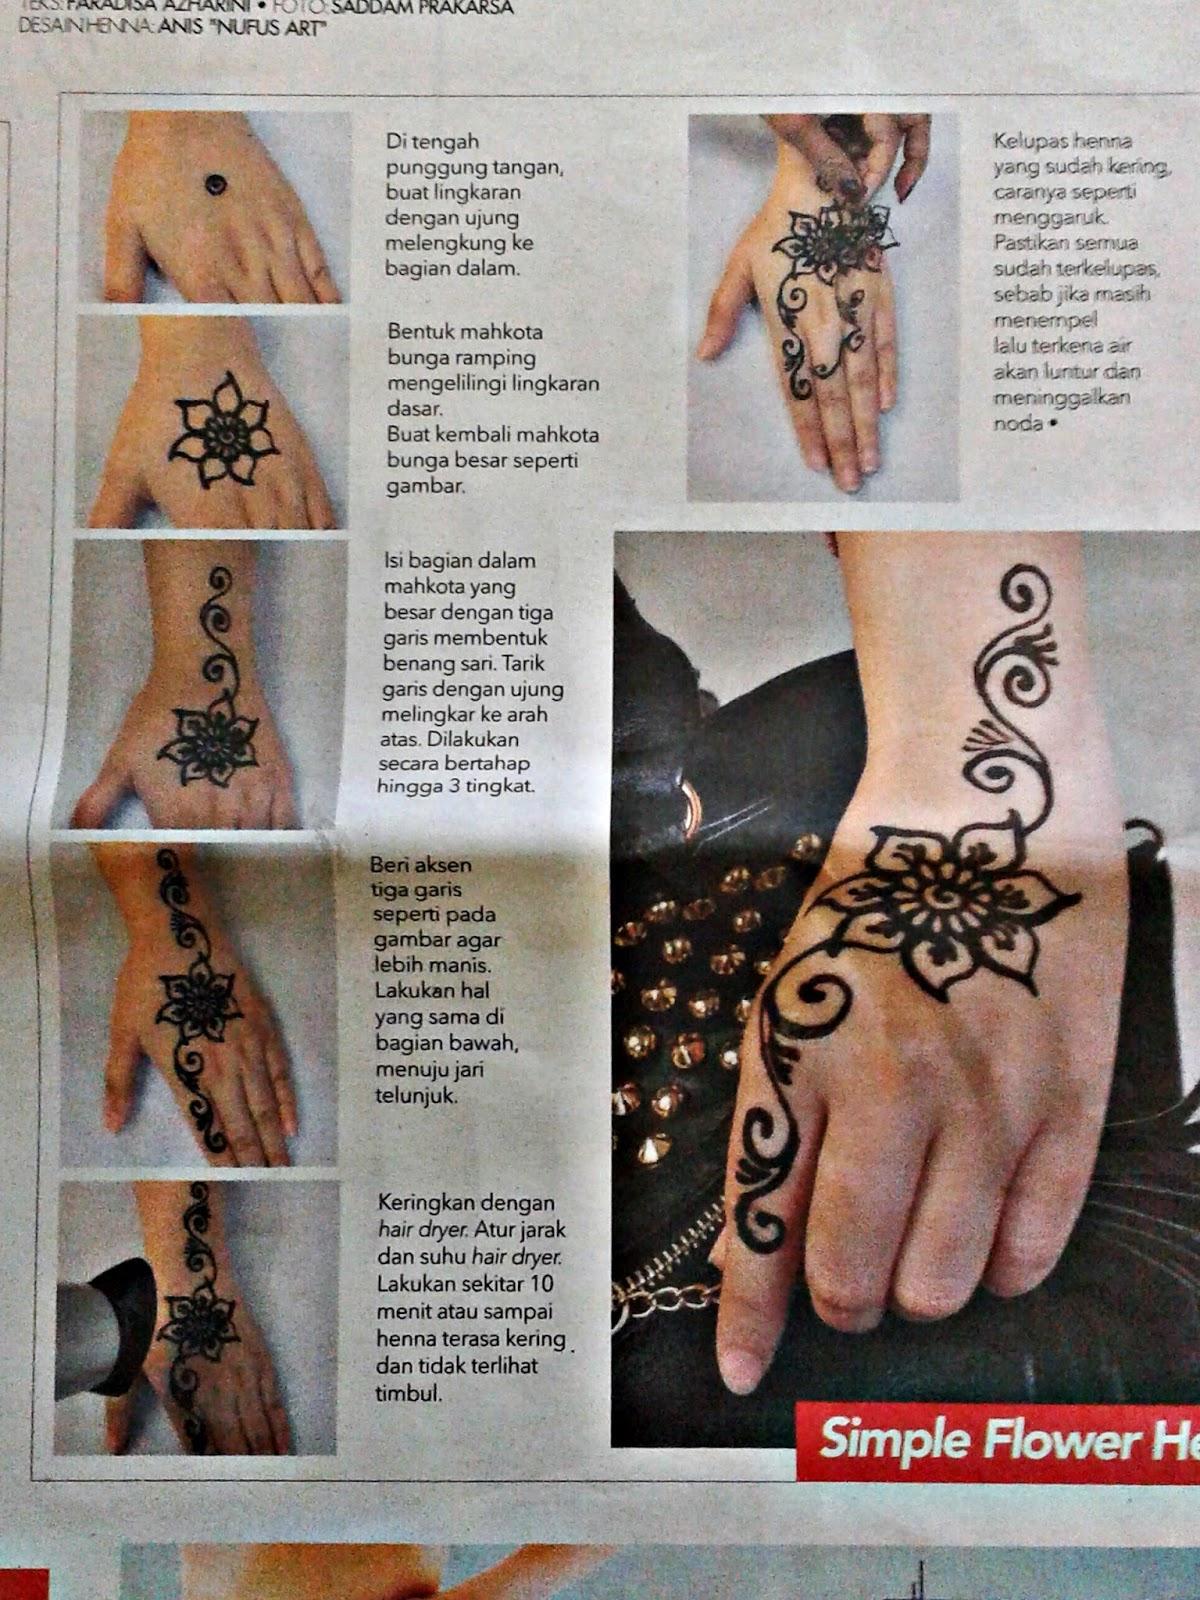 Tutorial Lukis Henna Oleh Nufus Art Di Tabloid Wanita Indonesia